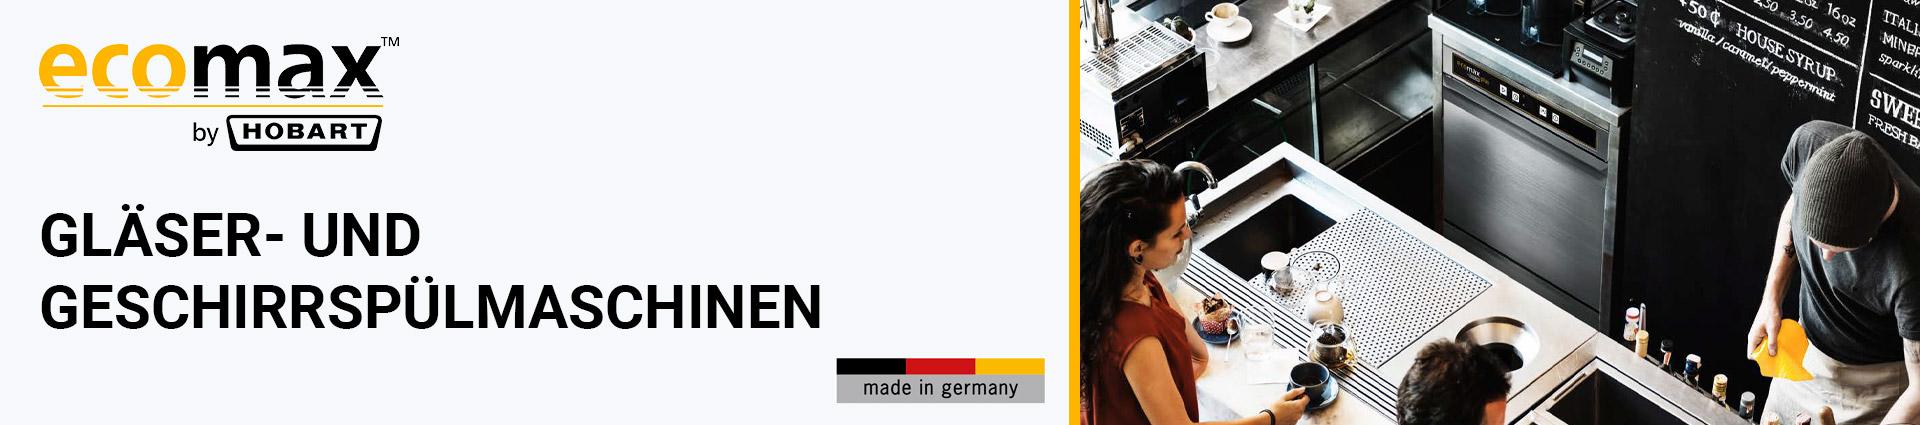 Ecomax by Hobart Spülmaschinen Banner